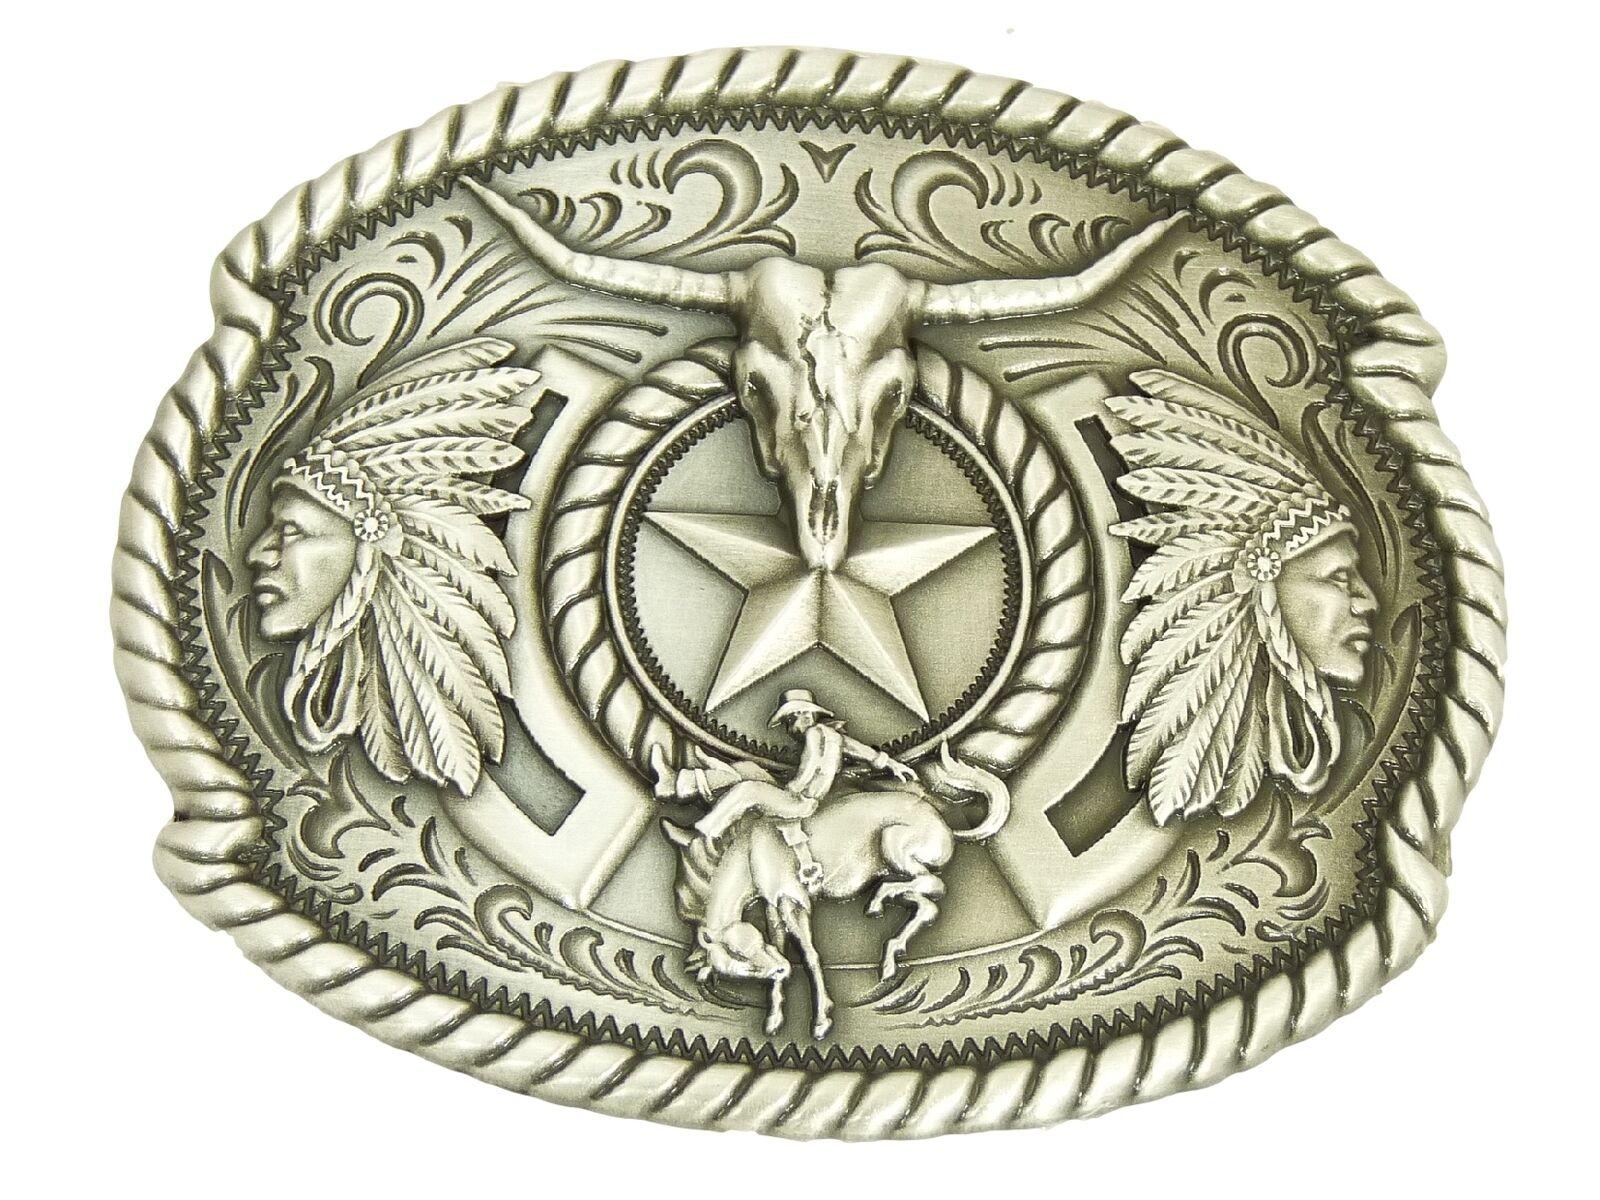 "Gürtelschnalle Buckle Initialien  Buchstabe /"" H /""   Western Cowboy Name Letter"